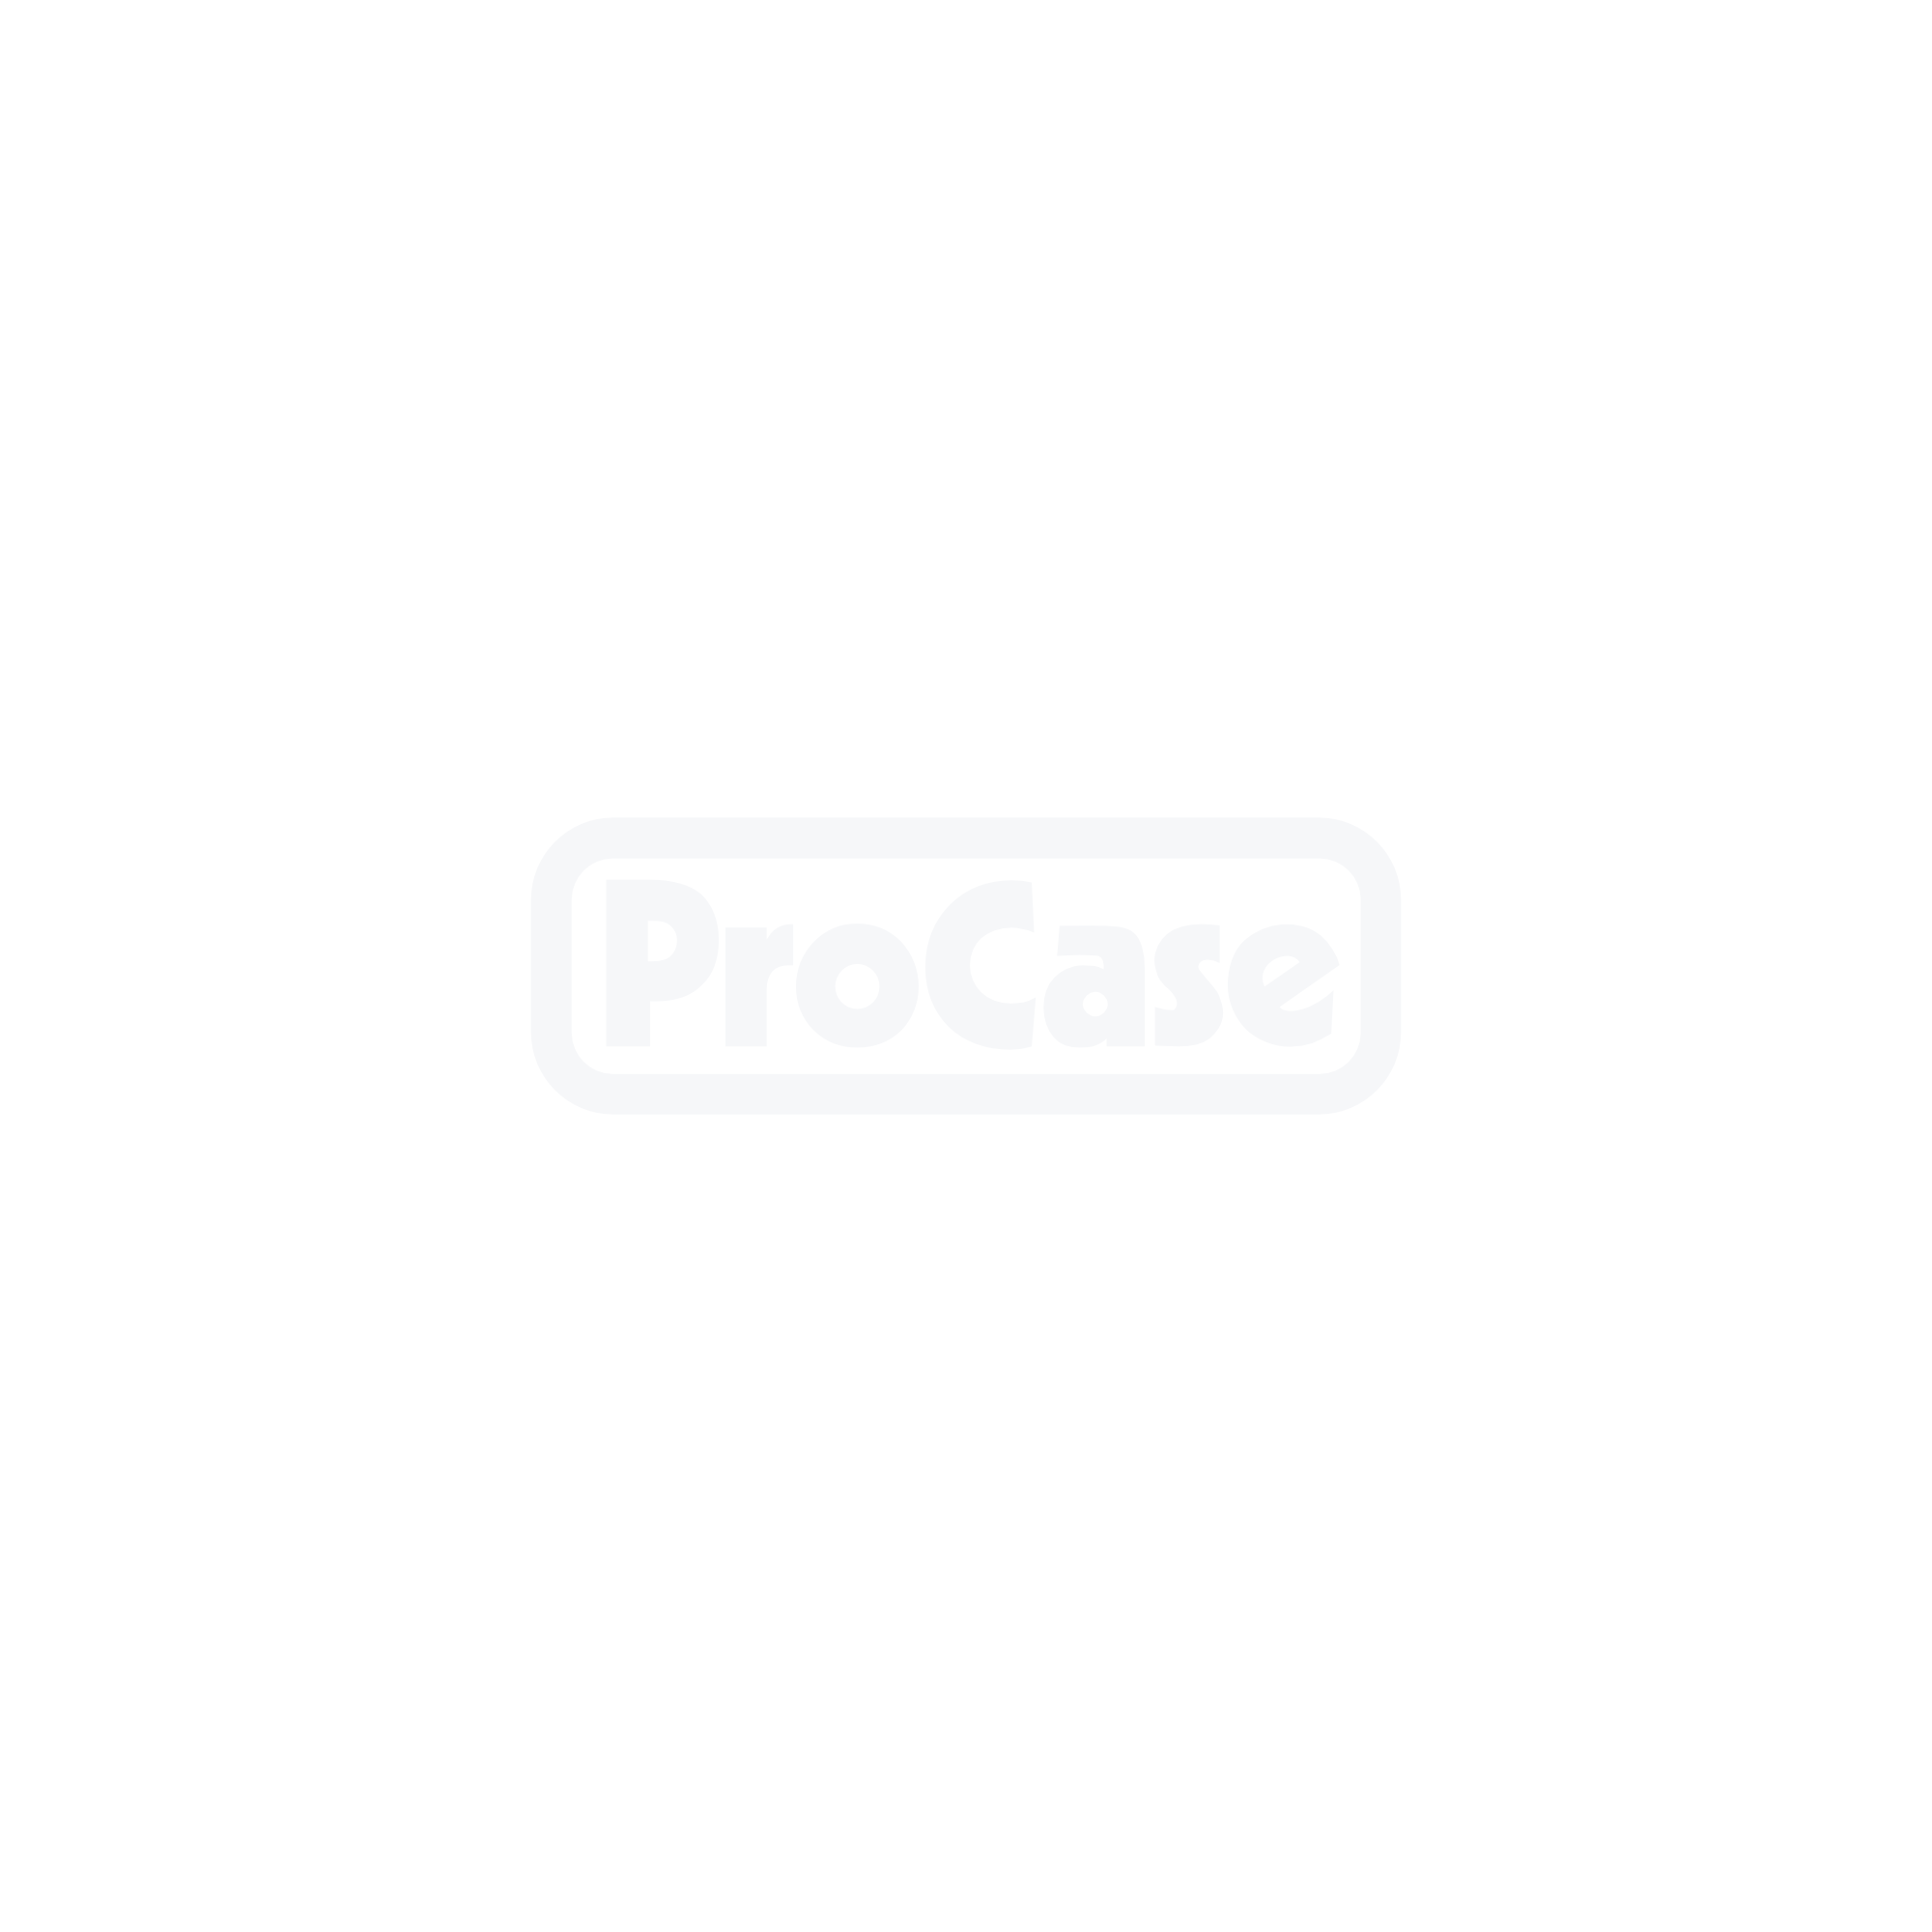 Transportwagen Rolltisch 800 x 600 mm